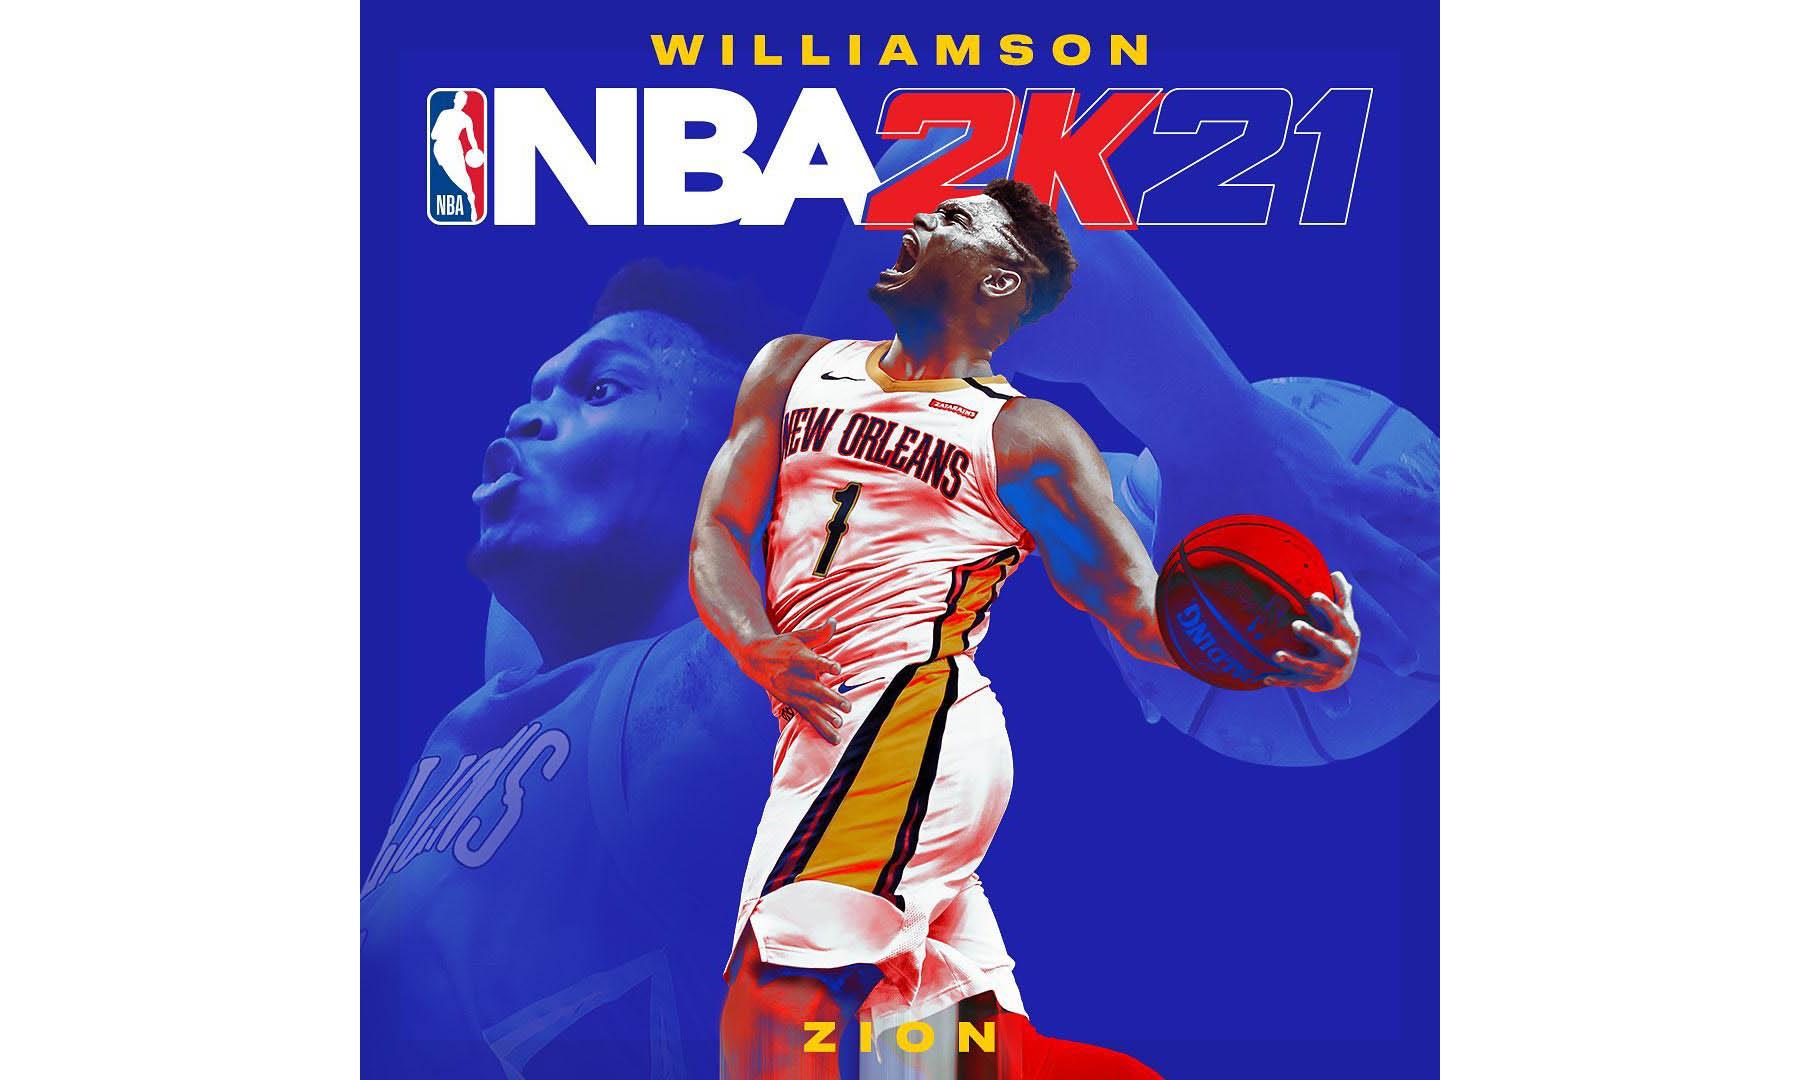 《NBA 2K21》揭晓另一位封面人物 Zion Williamson